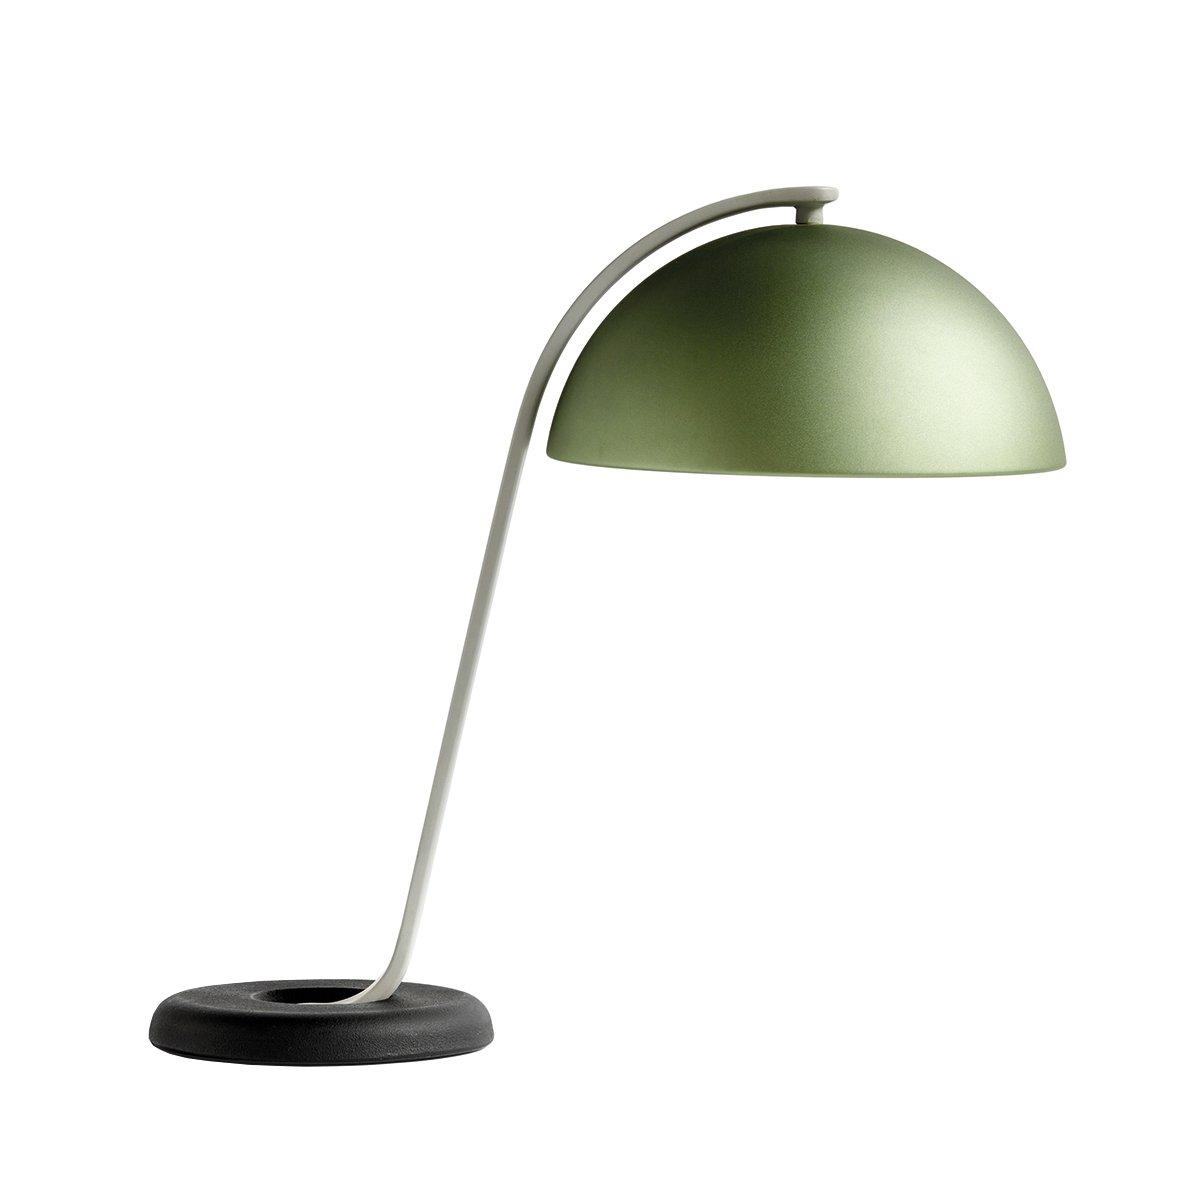 HAY Cloche Tafellamp - Mintgroen - Zwart